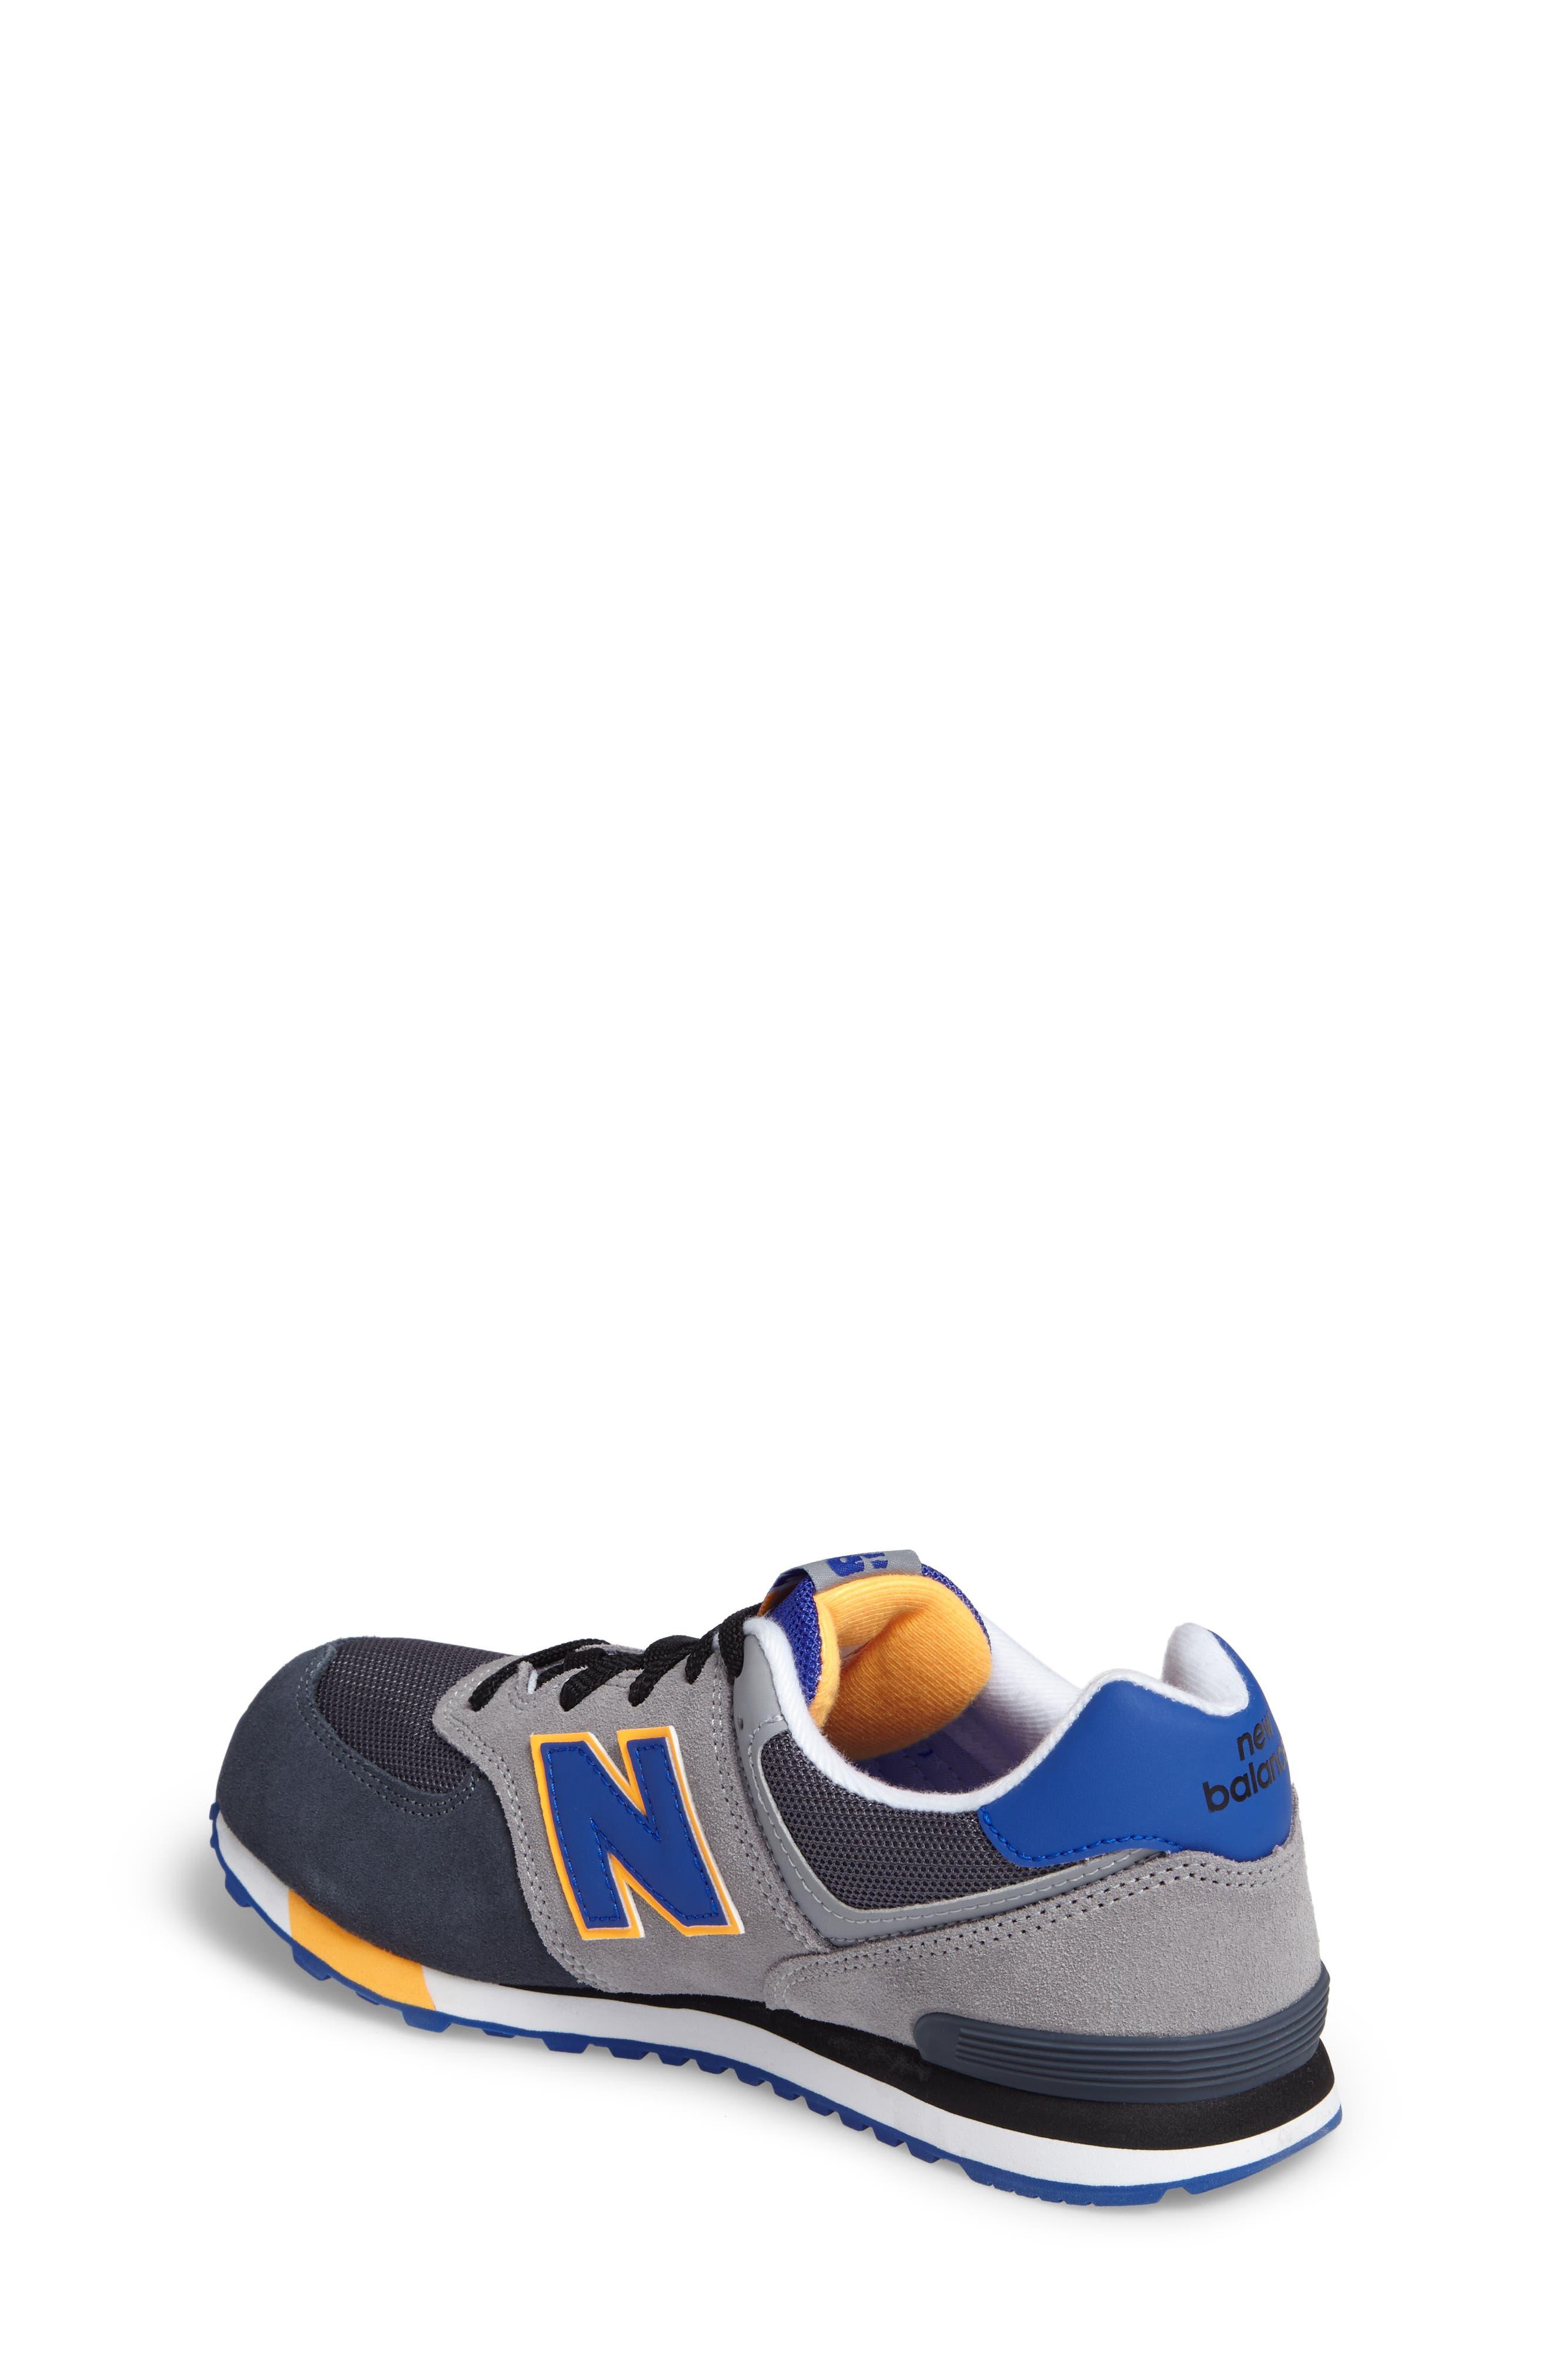 574 Cut & Paste Sneaker,                             Alternate thumbnail 2, color,                             Grey/ Blue